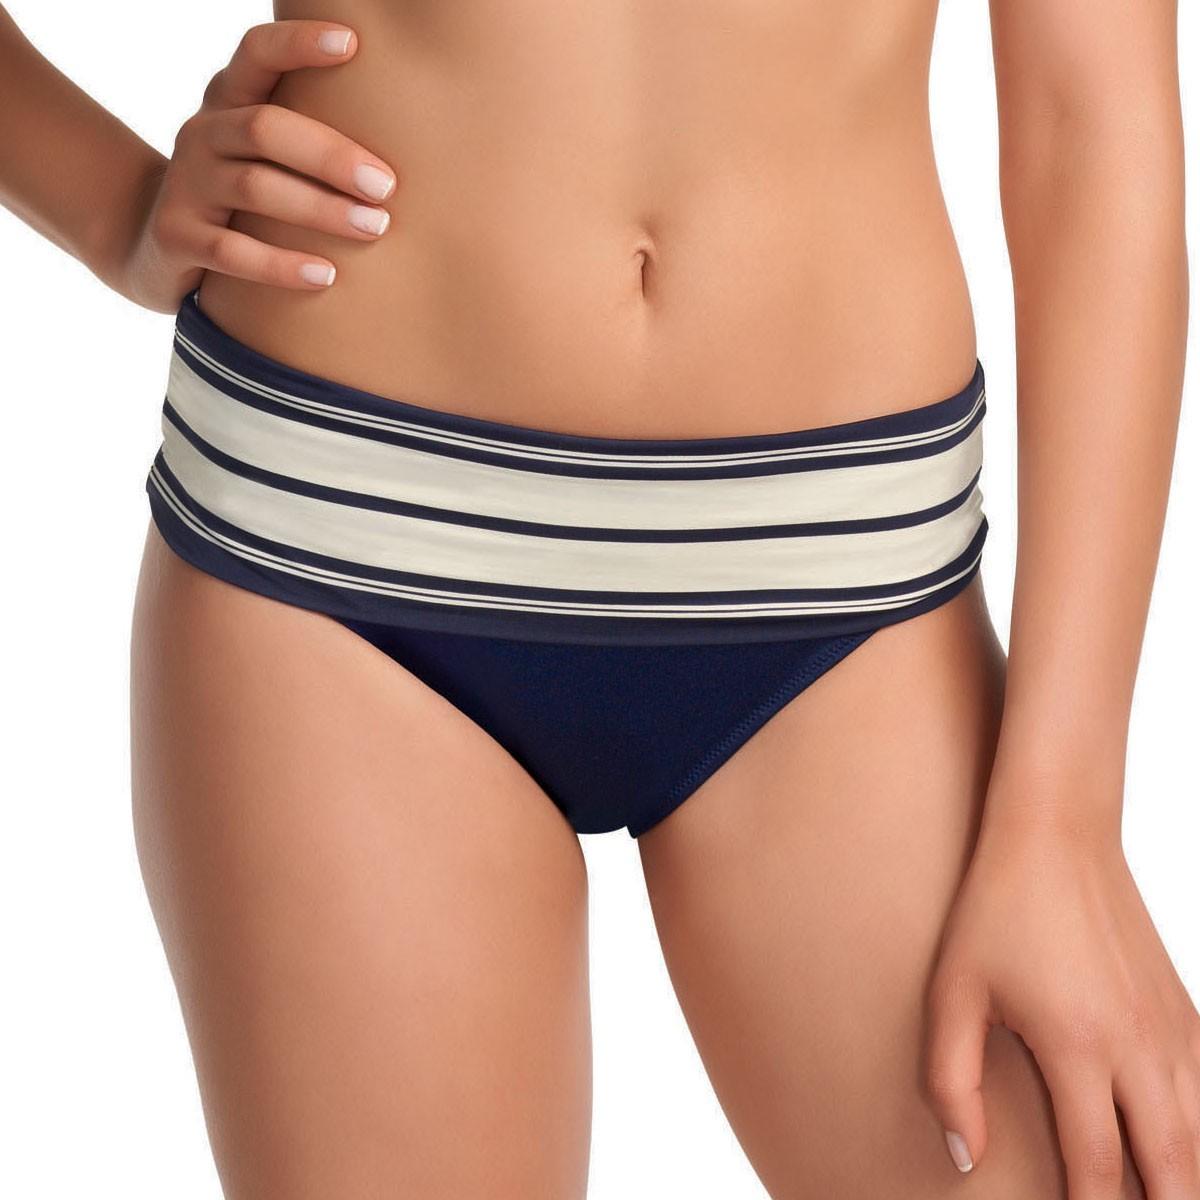 Fantasie Biarritz Fold Bikini Briefs - Midnight